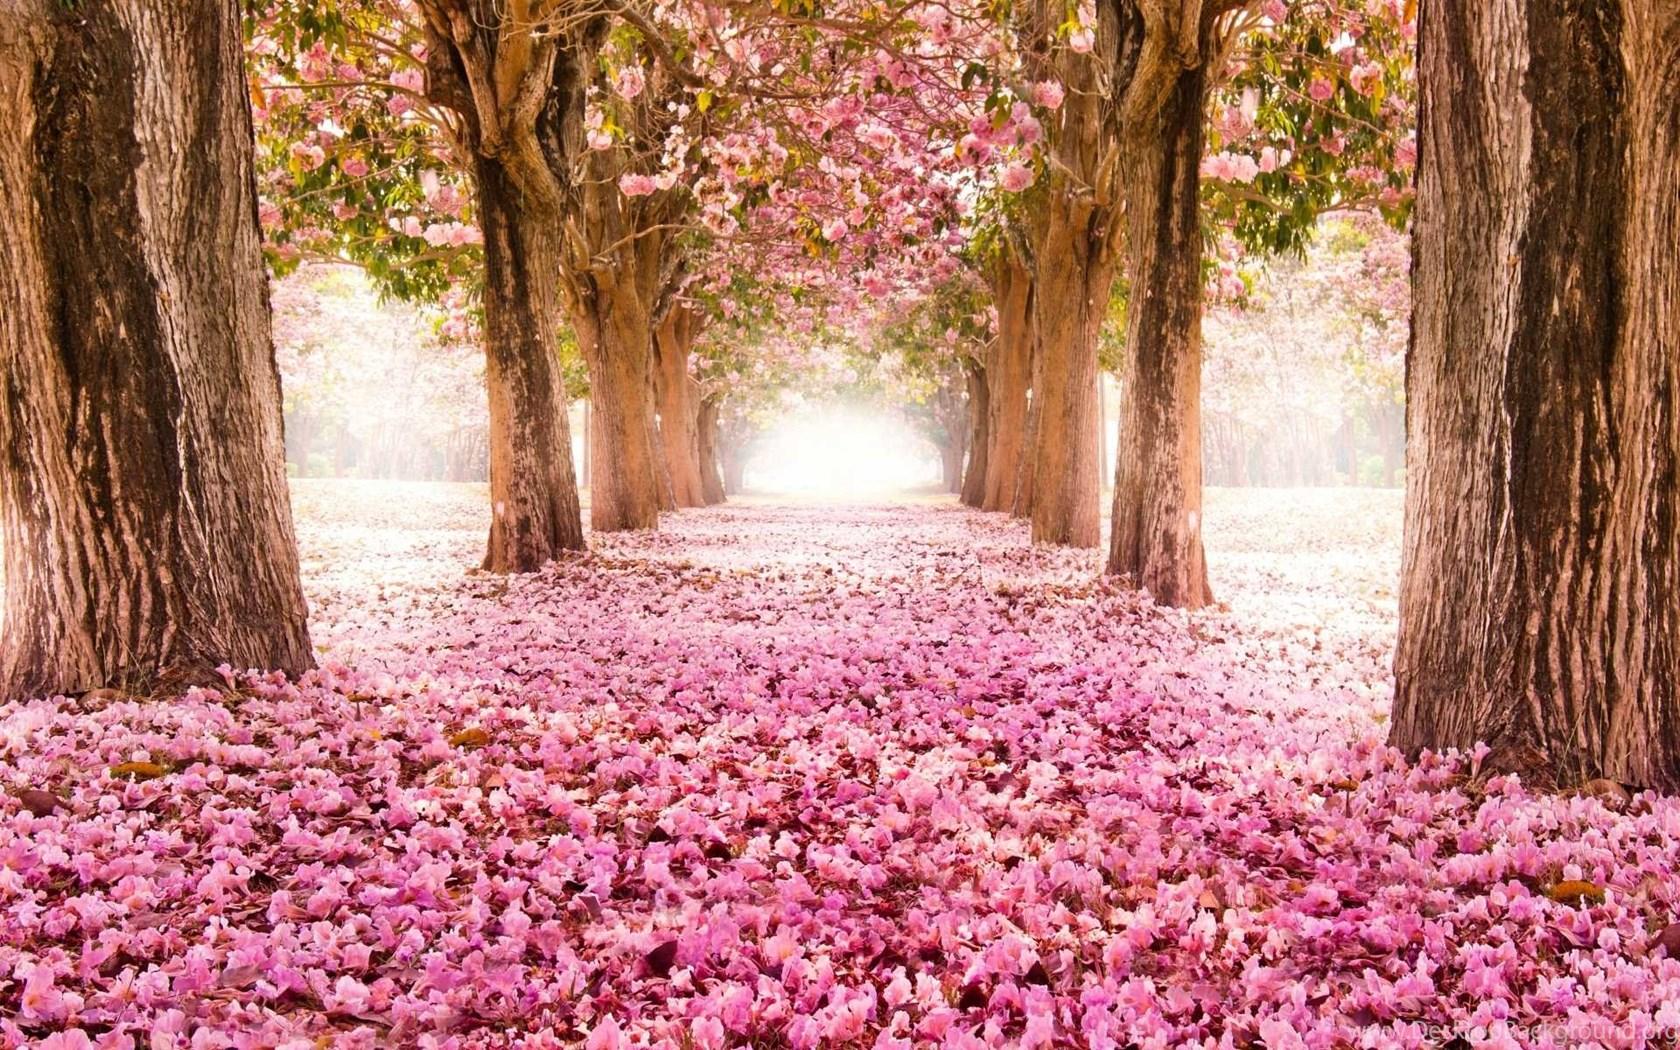 Spring Flowers Wallpapers Hd Of Cool And Beautiful Flowers Desktop